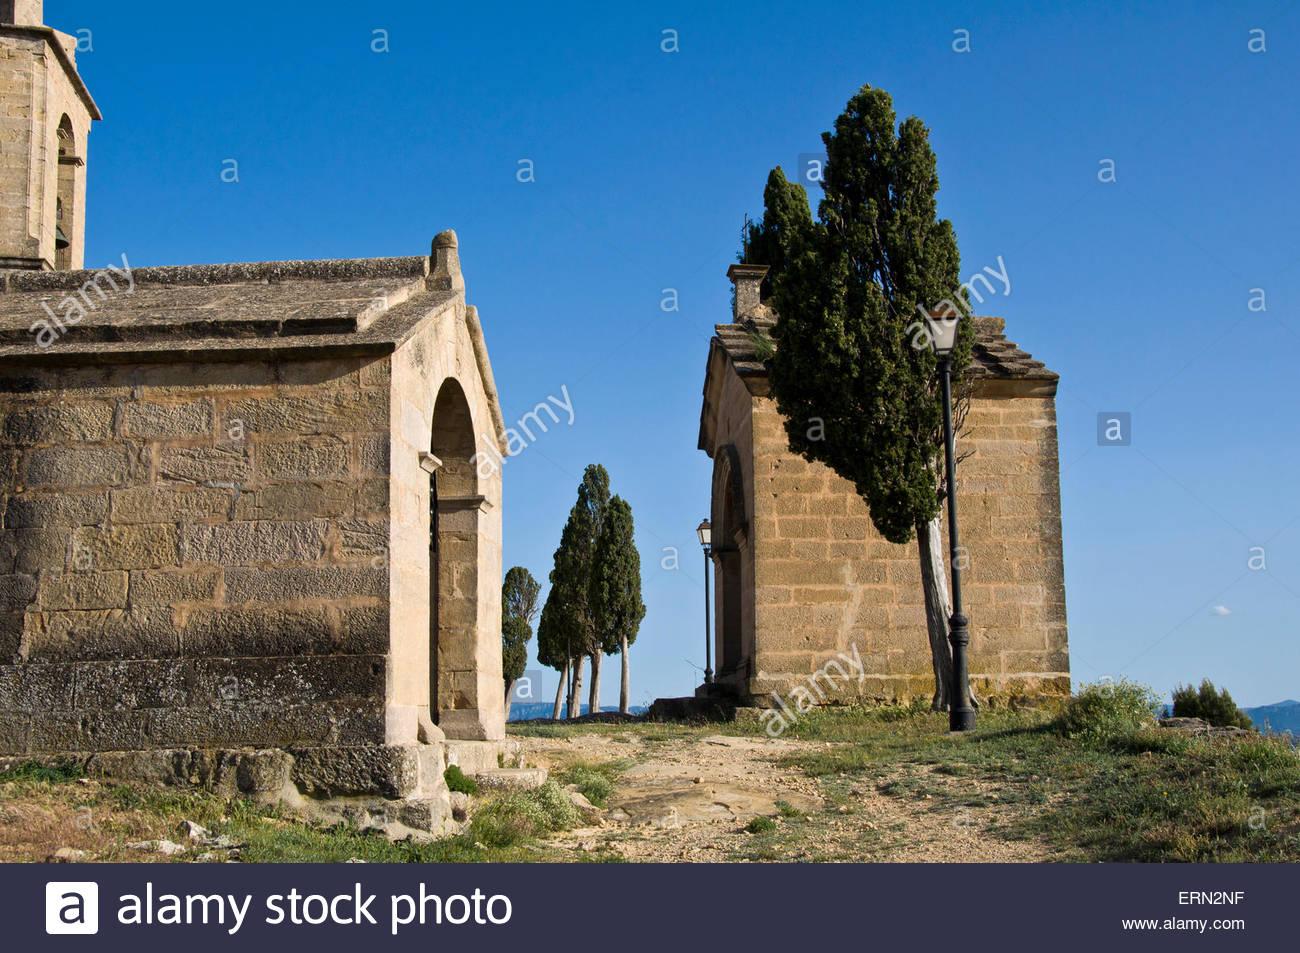 Ermita de San Cristóbal Calaceite, Matarraña region, Teruel, Aragon Community Spain - Stock Image